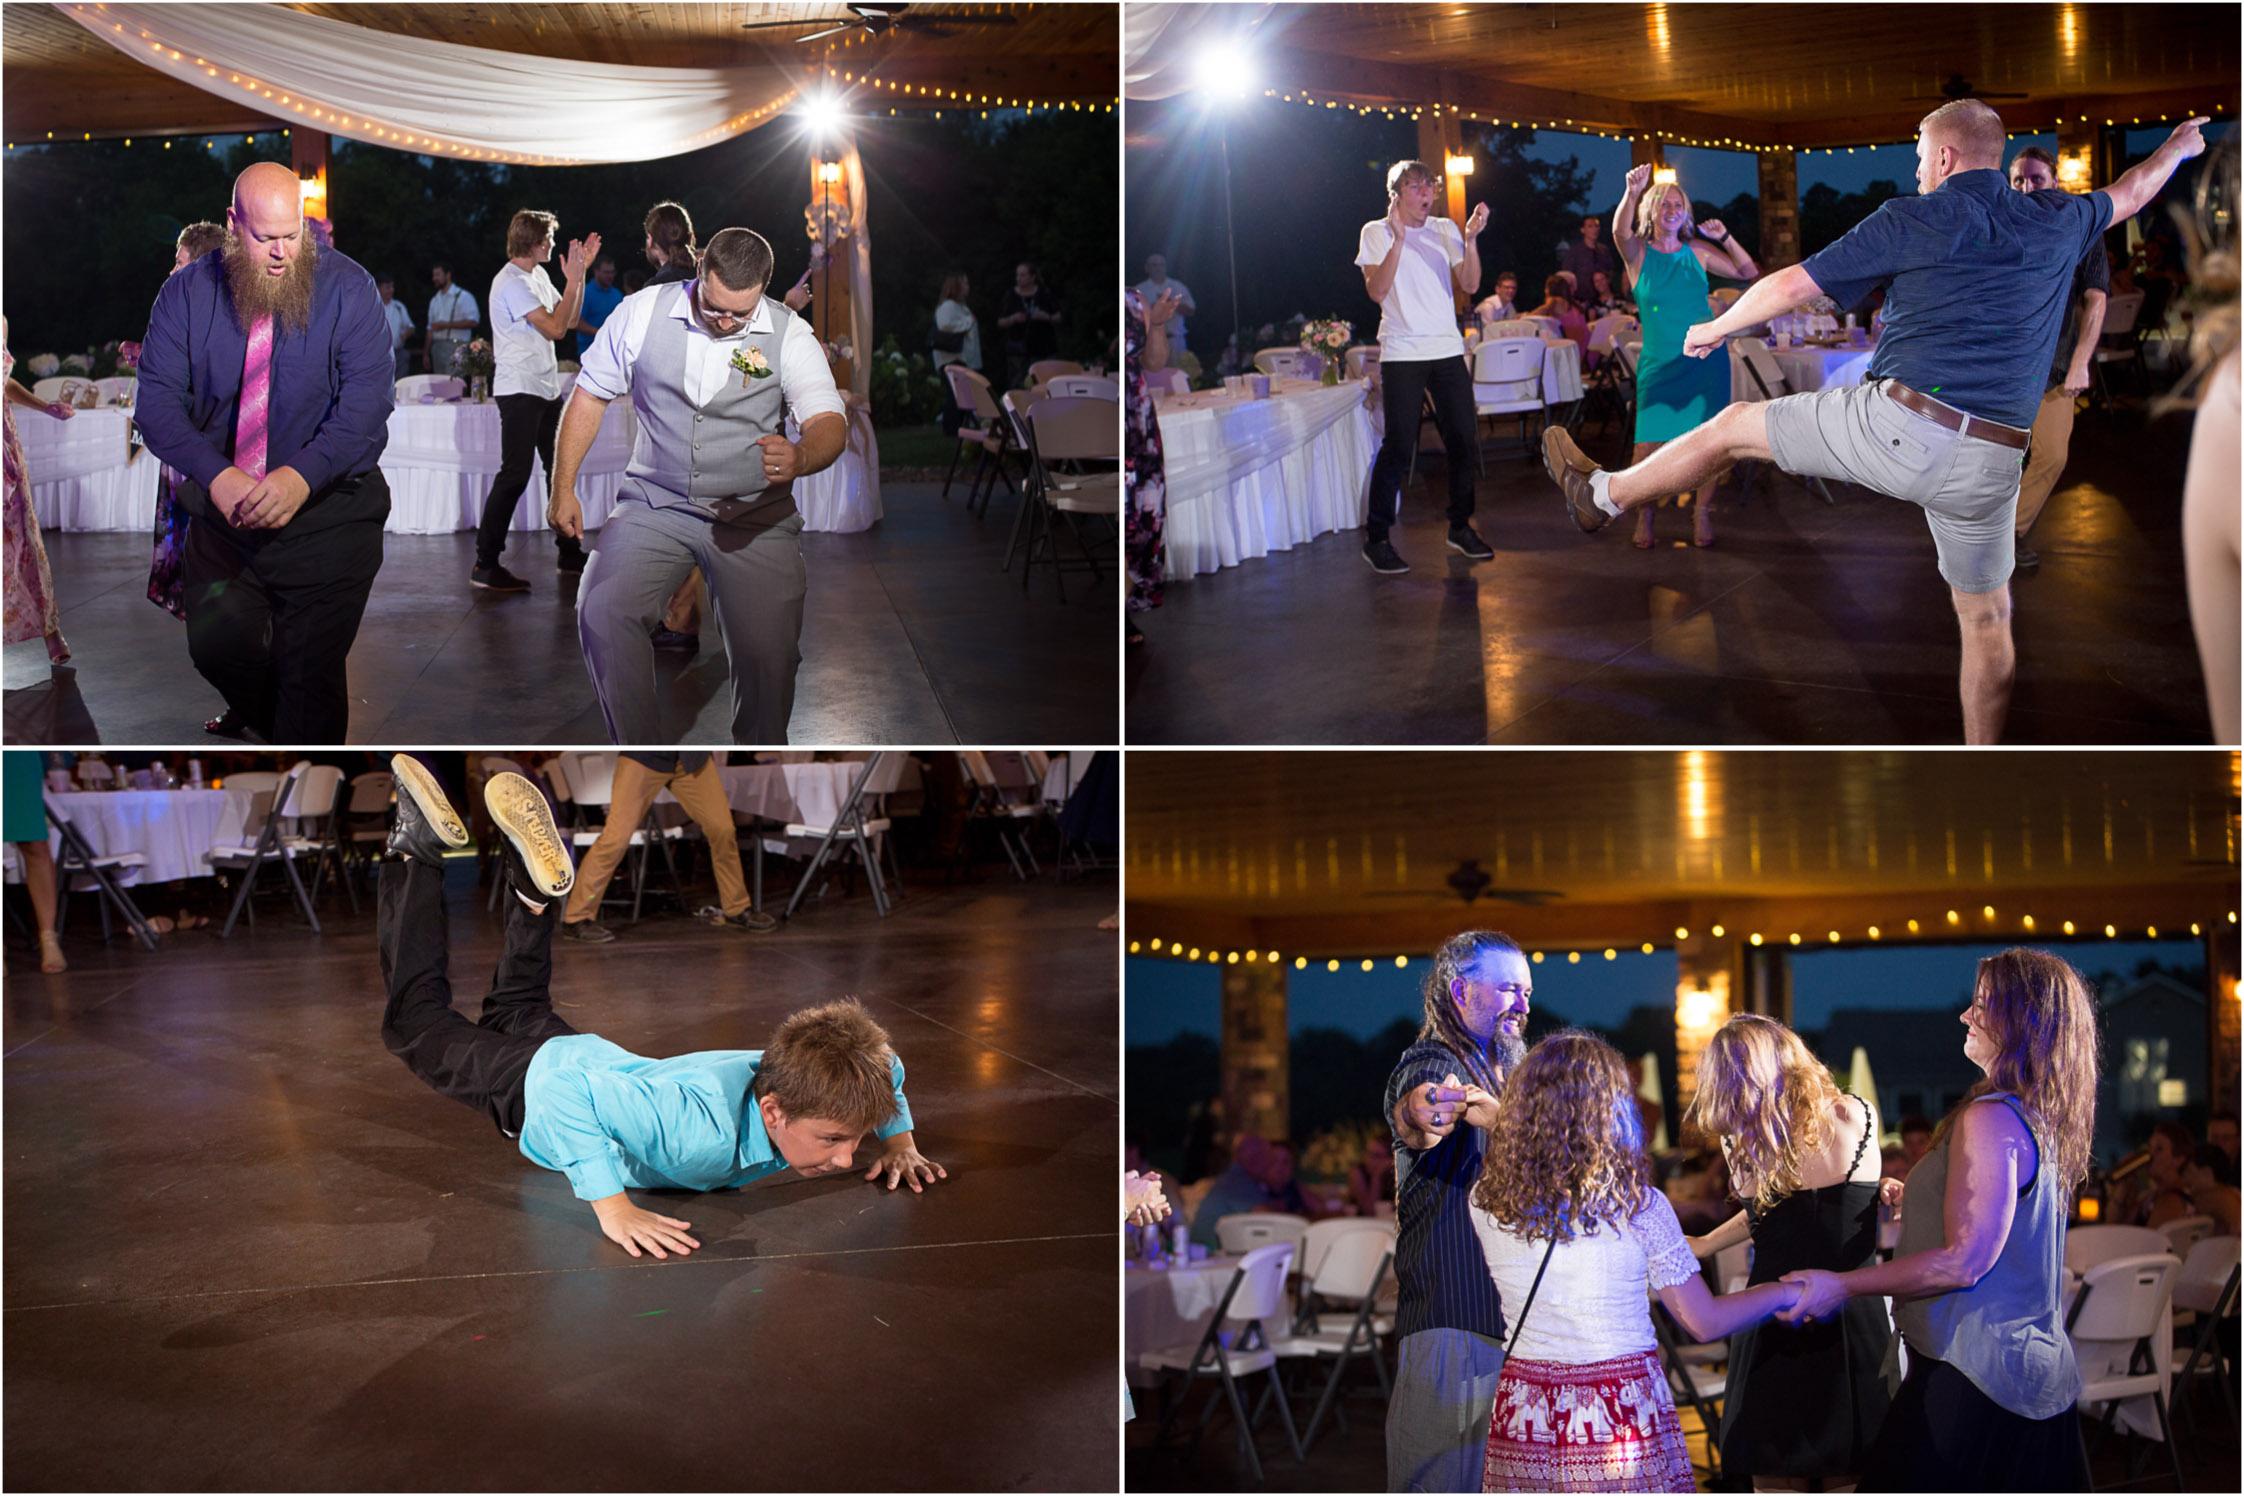 31-ridgetop-prescott-wisconsin-wedding-photographer-rustic-farm-corn-field-pavillion-reception-dance-mahonen-photography.jpg